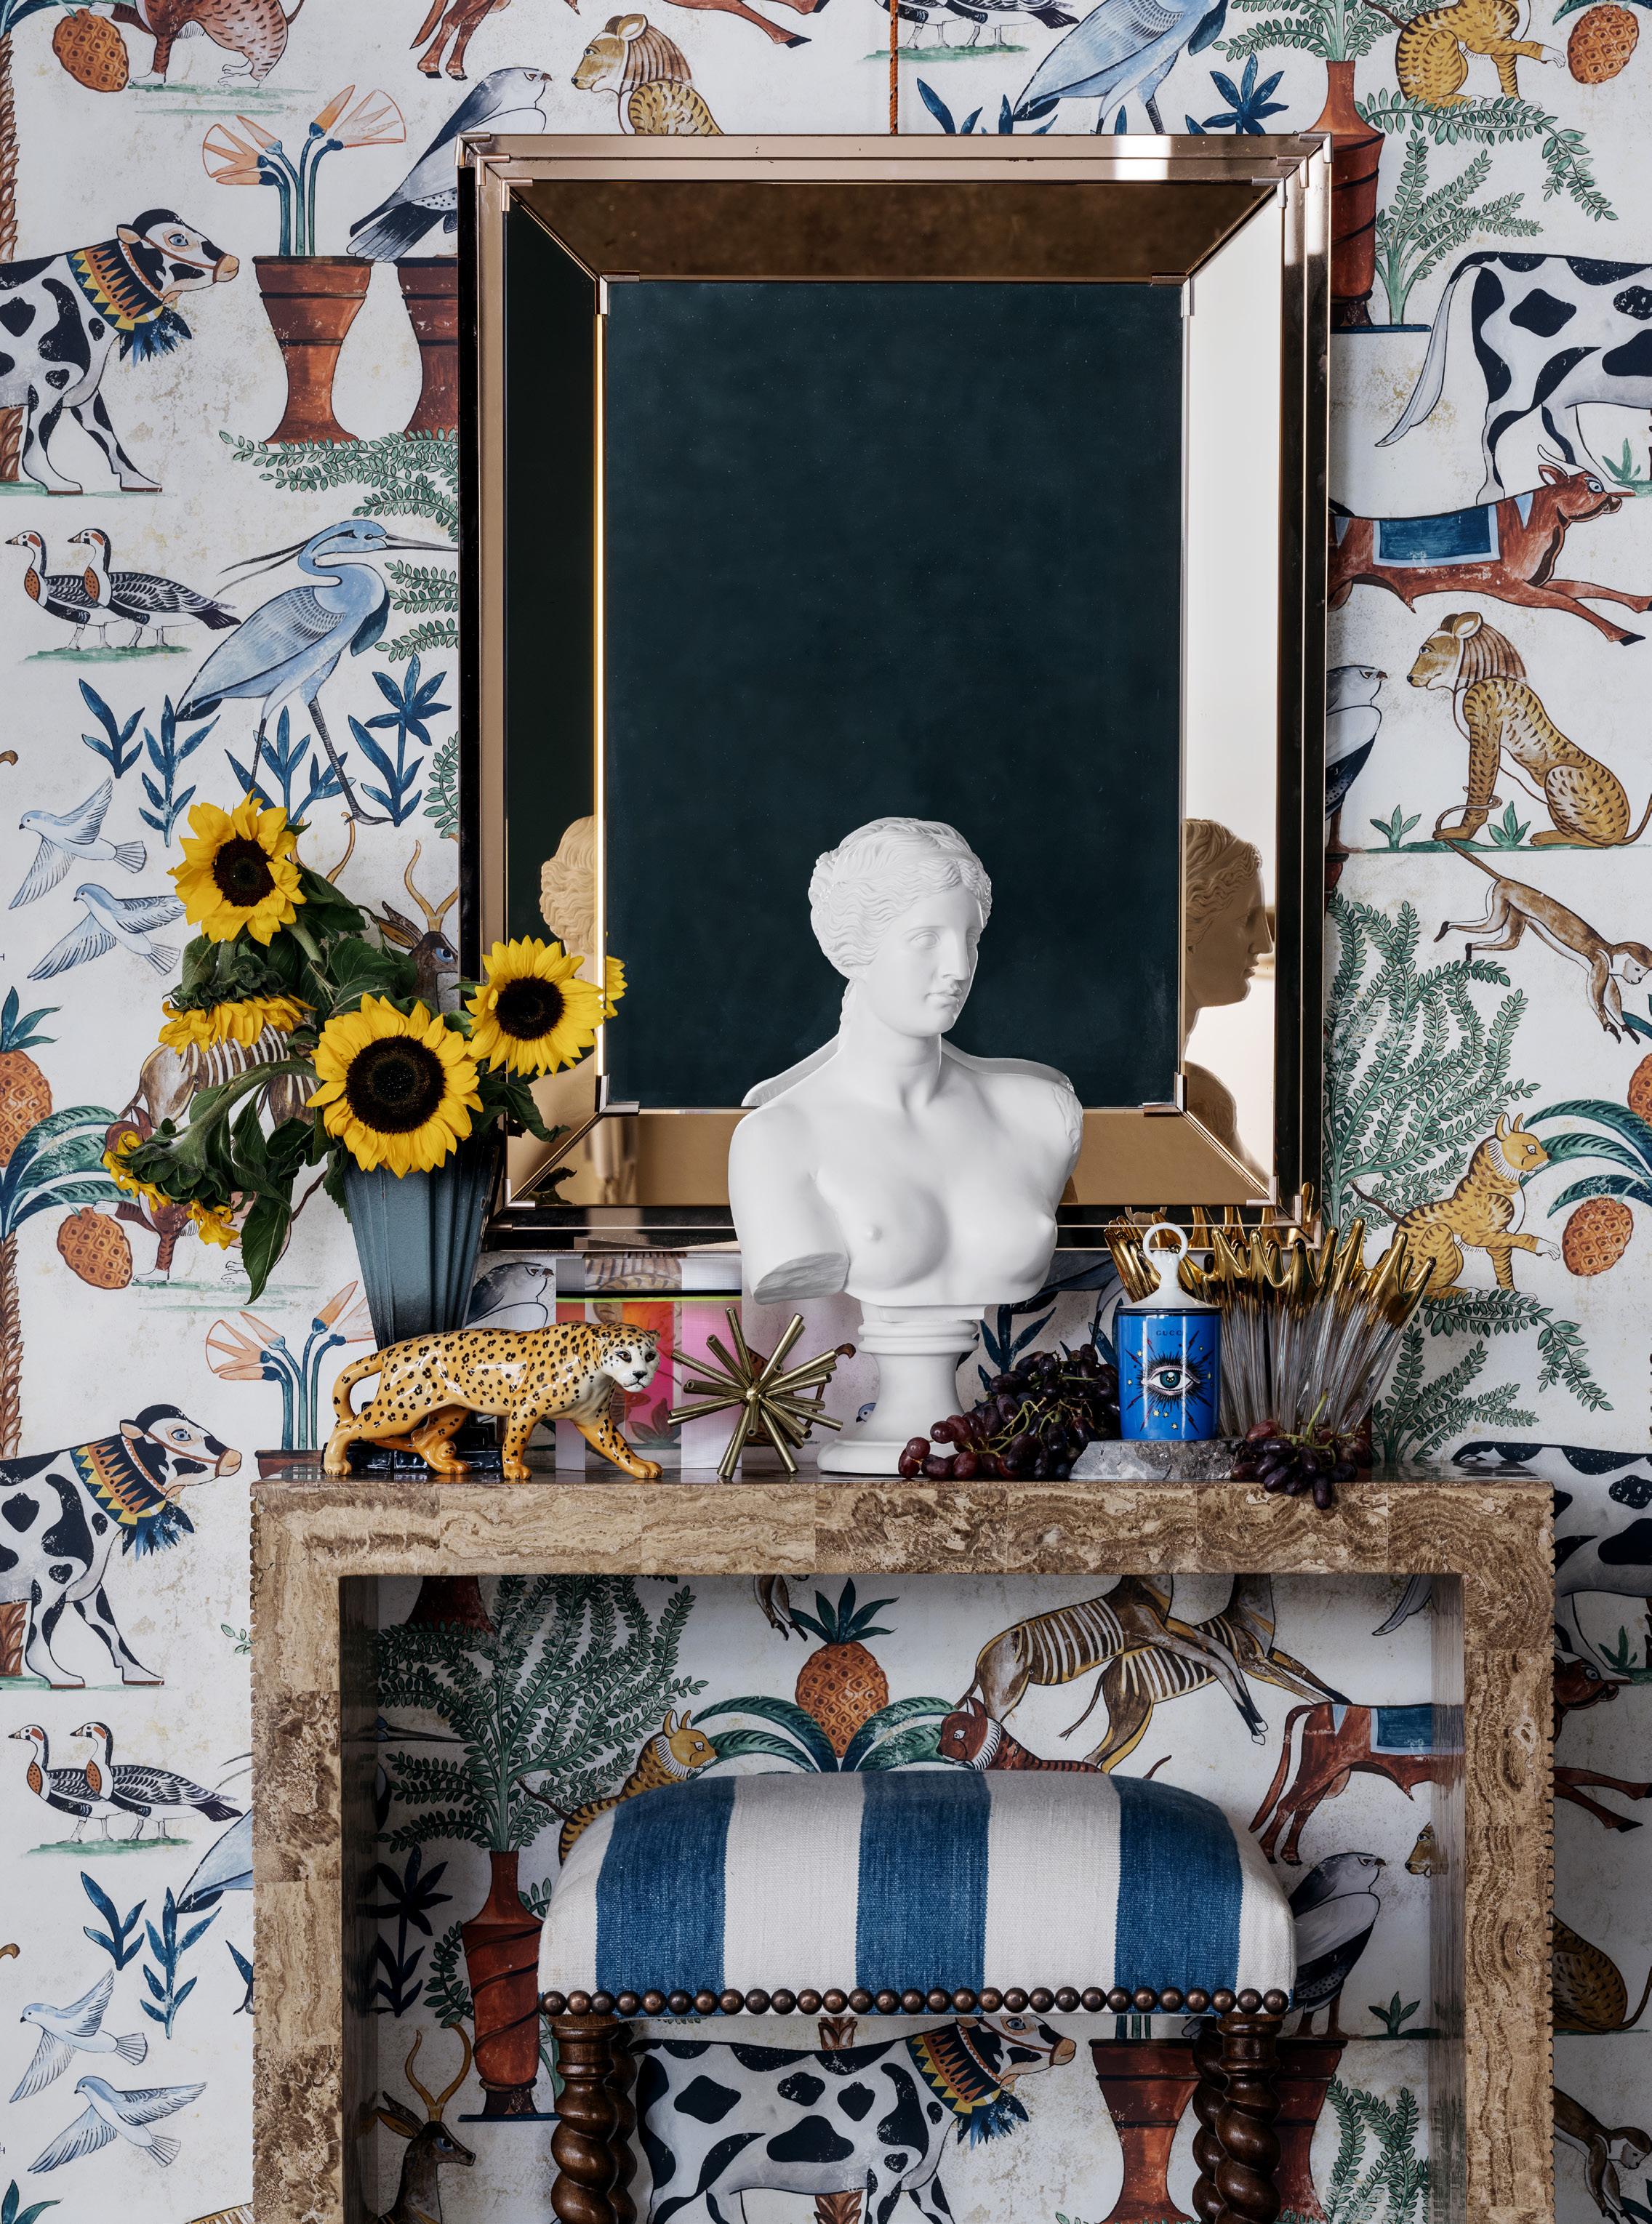 Belle Decorative Arts May 2018 Stylist Steve Cordony Photography Felix Forest